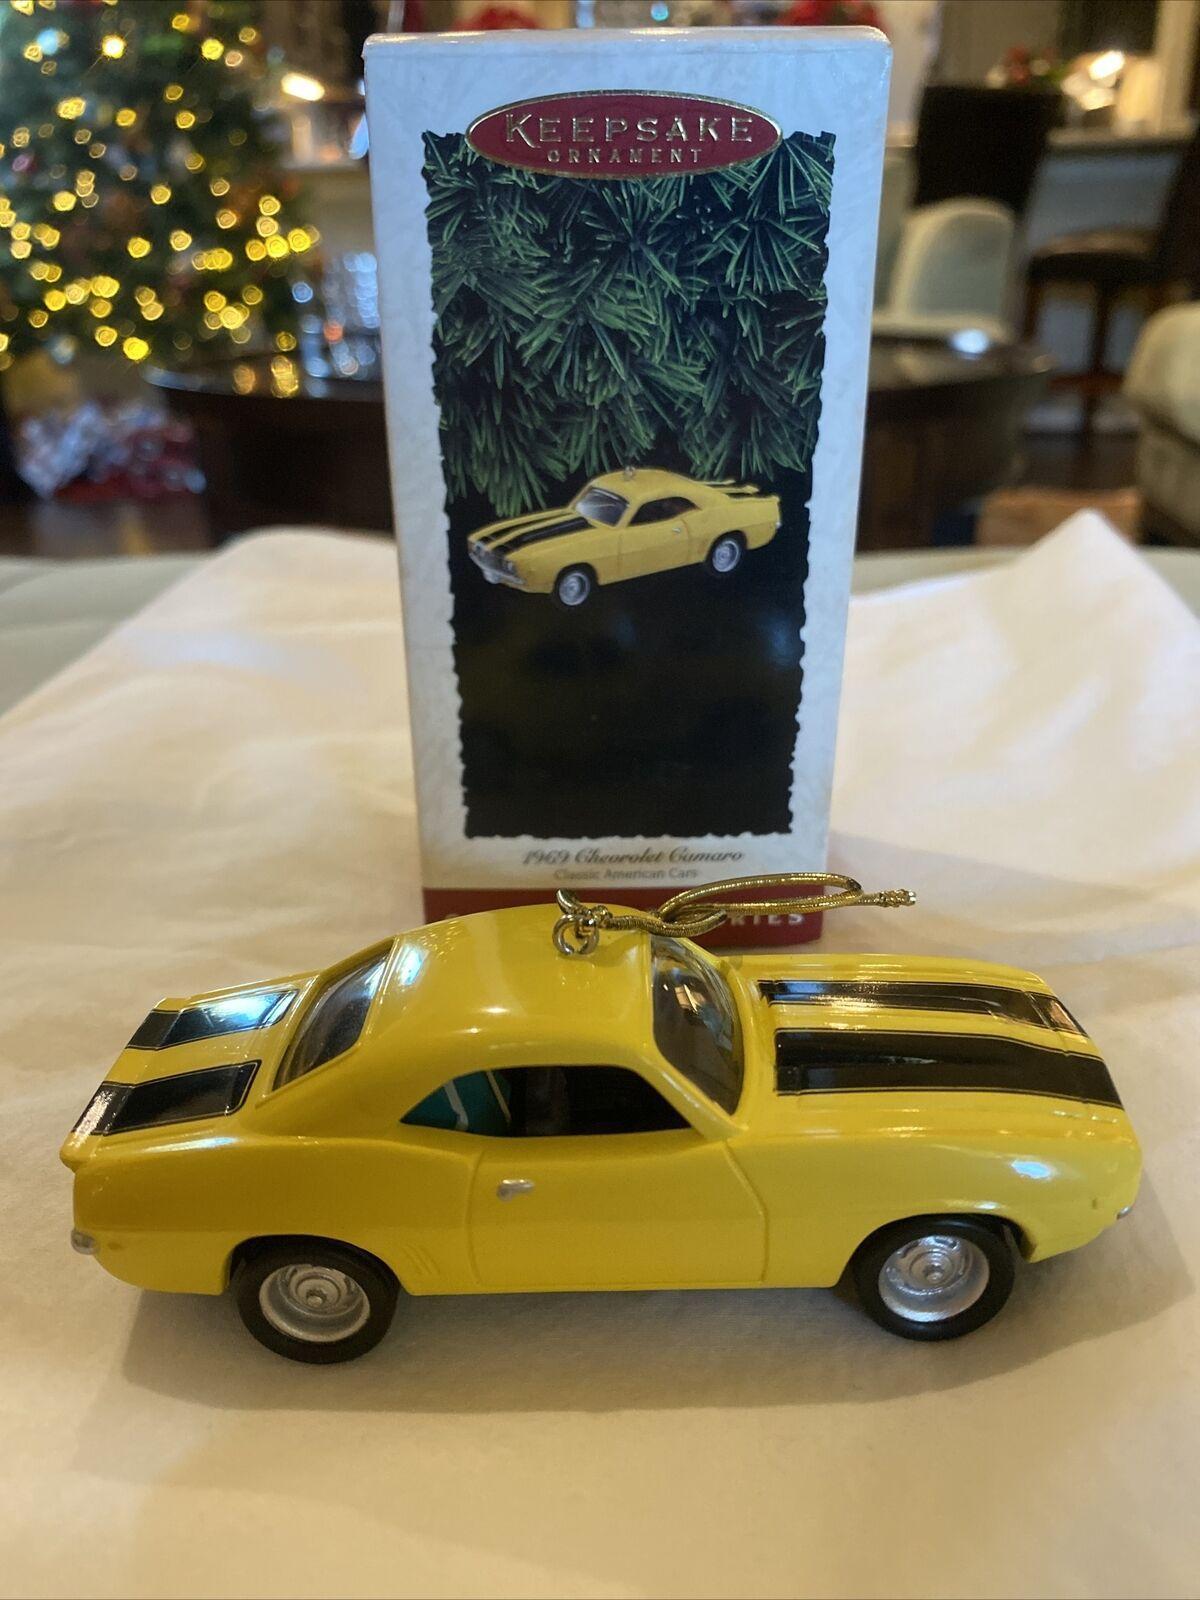 1995 1969 Chevrolet Camaro Hallmark Ornament Yellow Classic American Cars #5